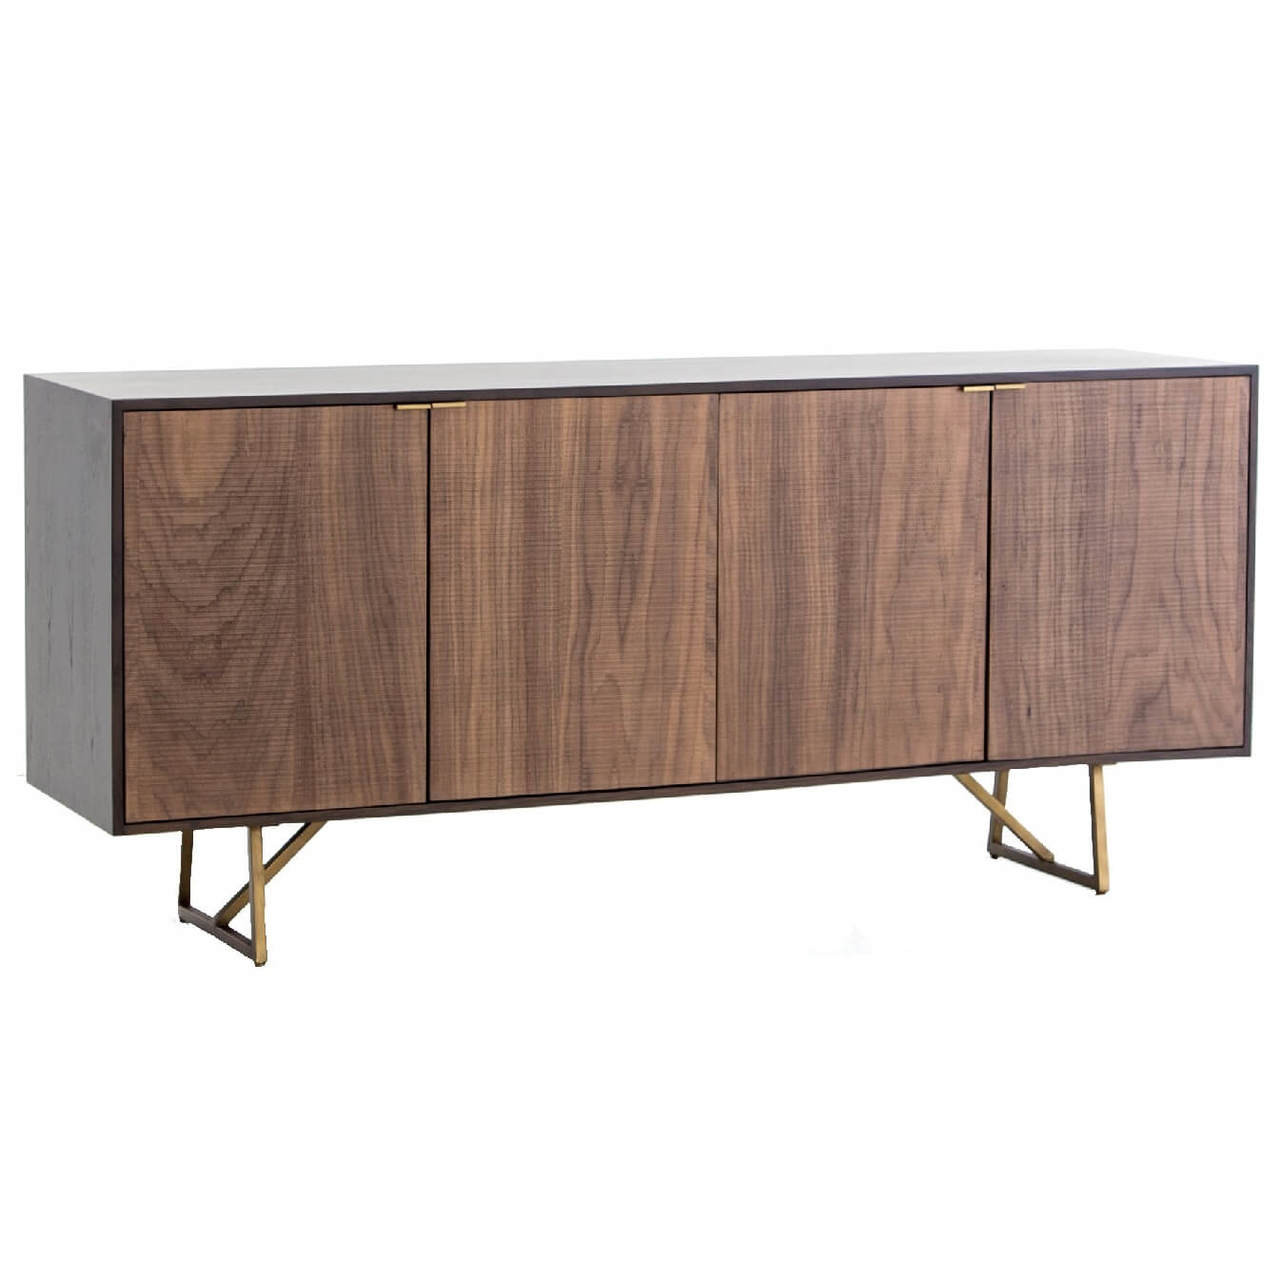 Kapri Antique Bronze Base Walnut Wood Media Cabinet - Kapri Antique Bronze Base Walnut Wood Media Cabinet 72